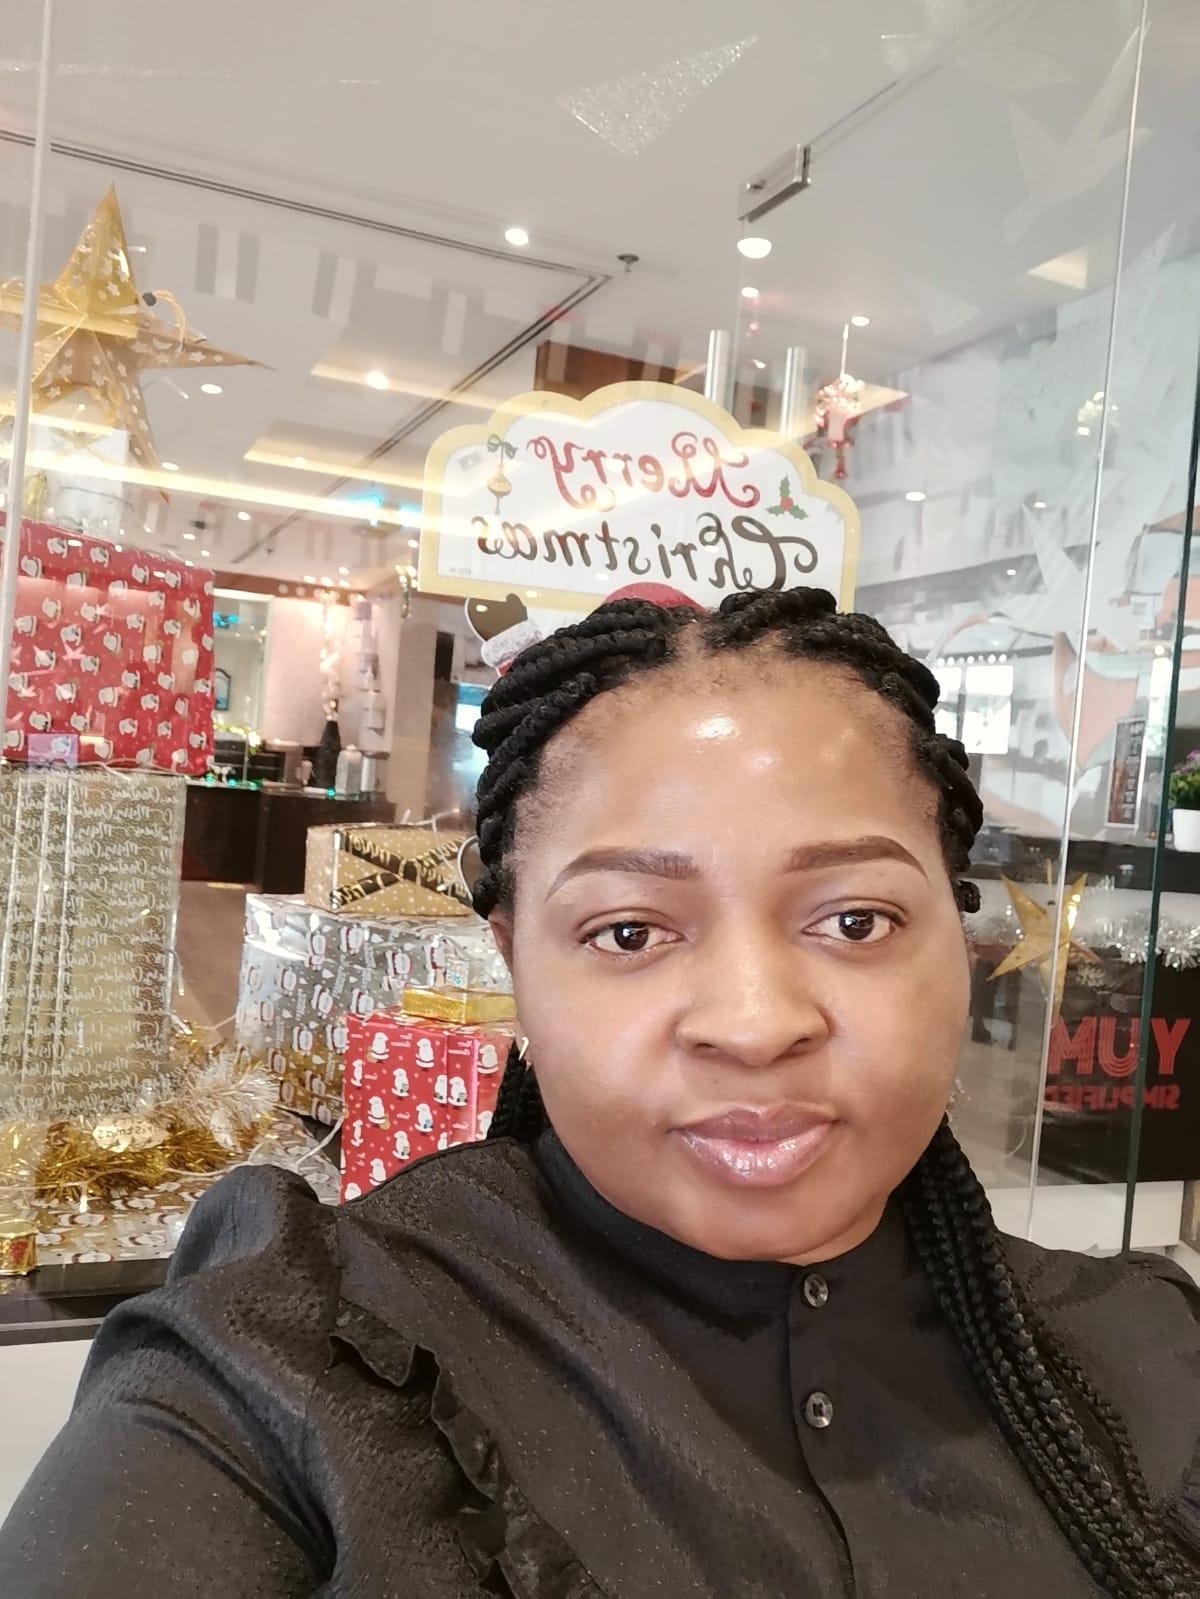 Mouneke ifeoma Bridget_IM_2021051308251792.jpg